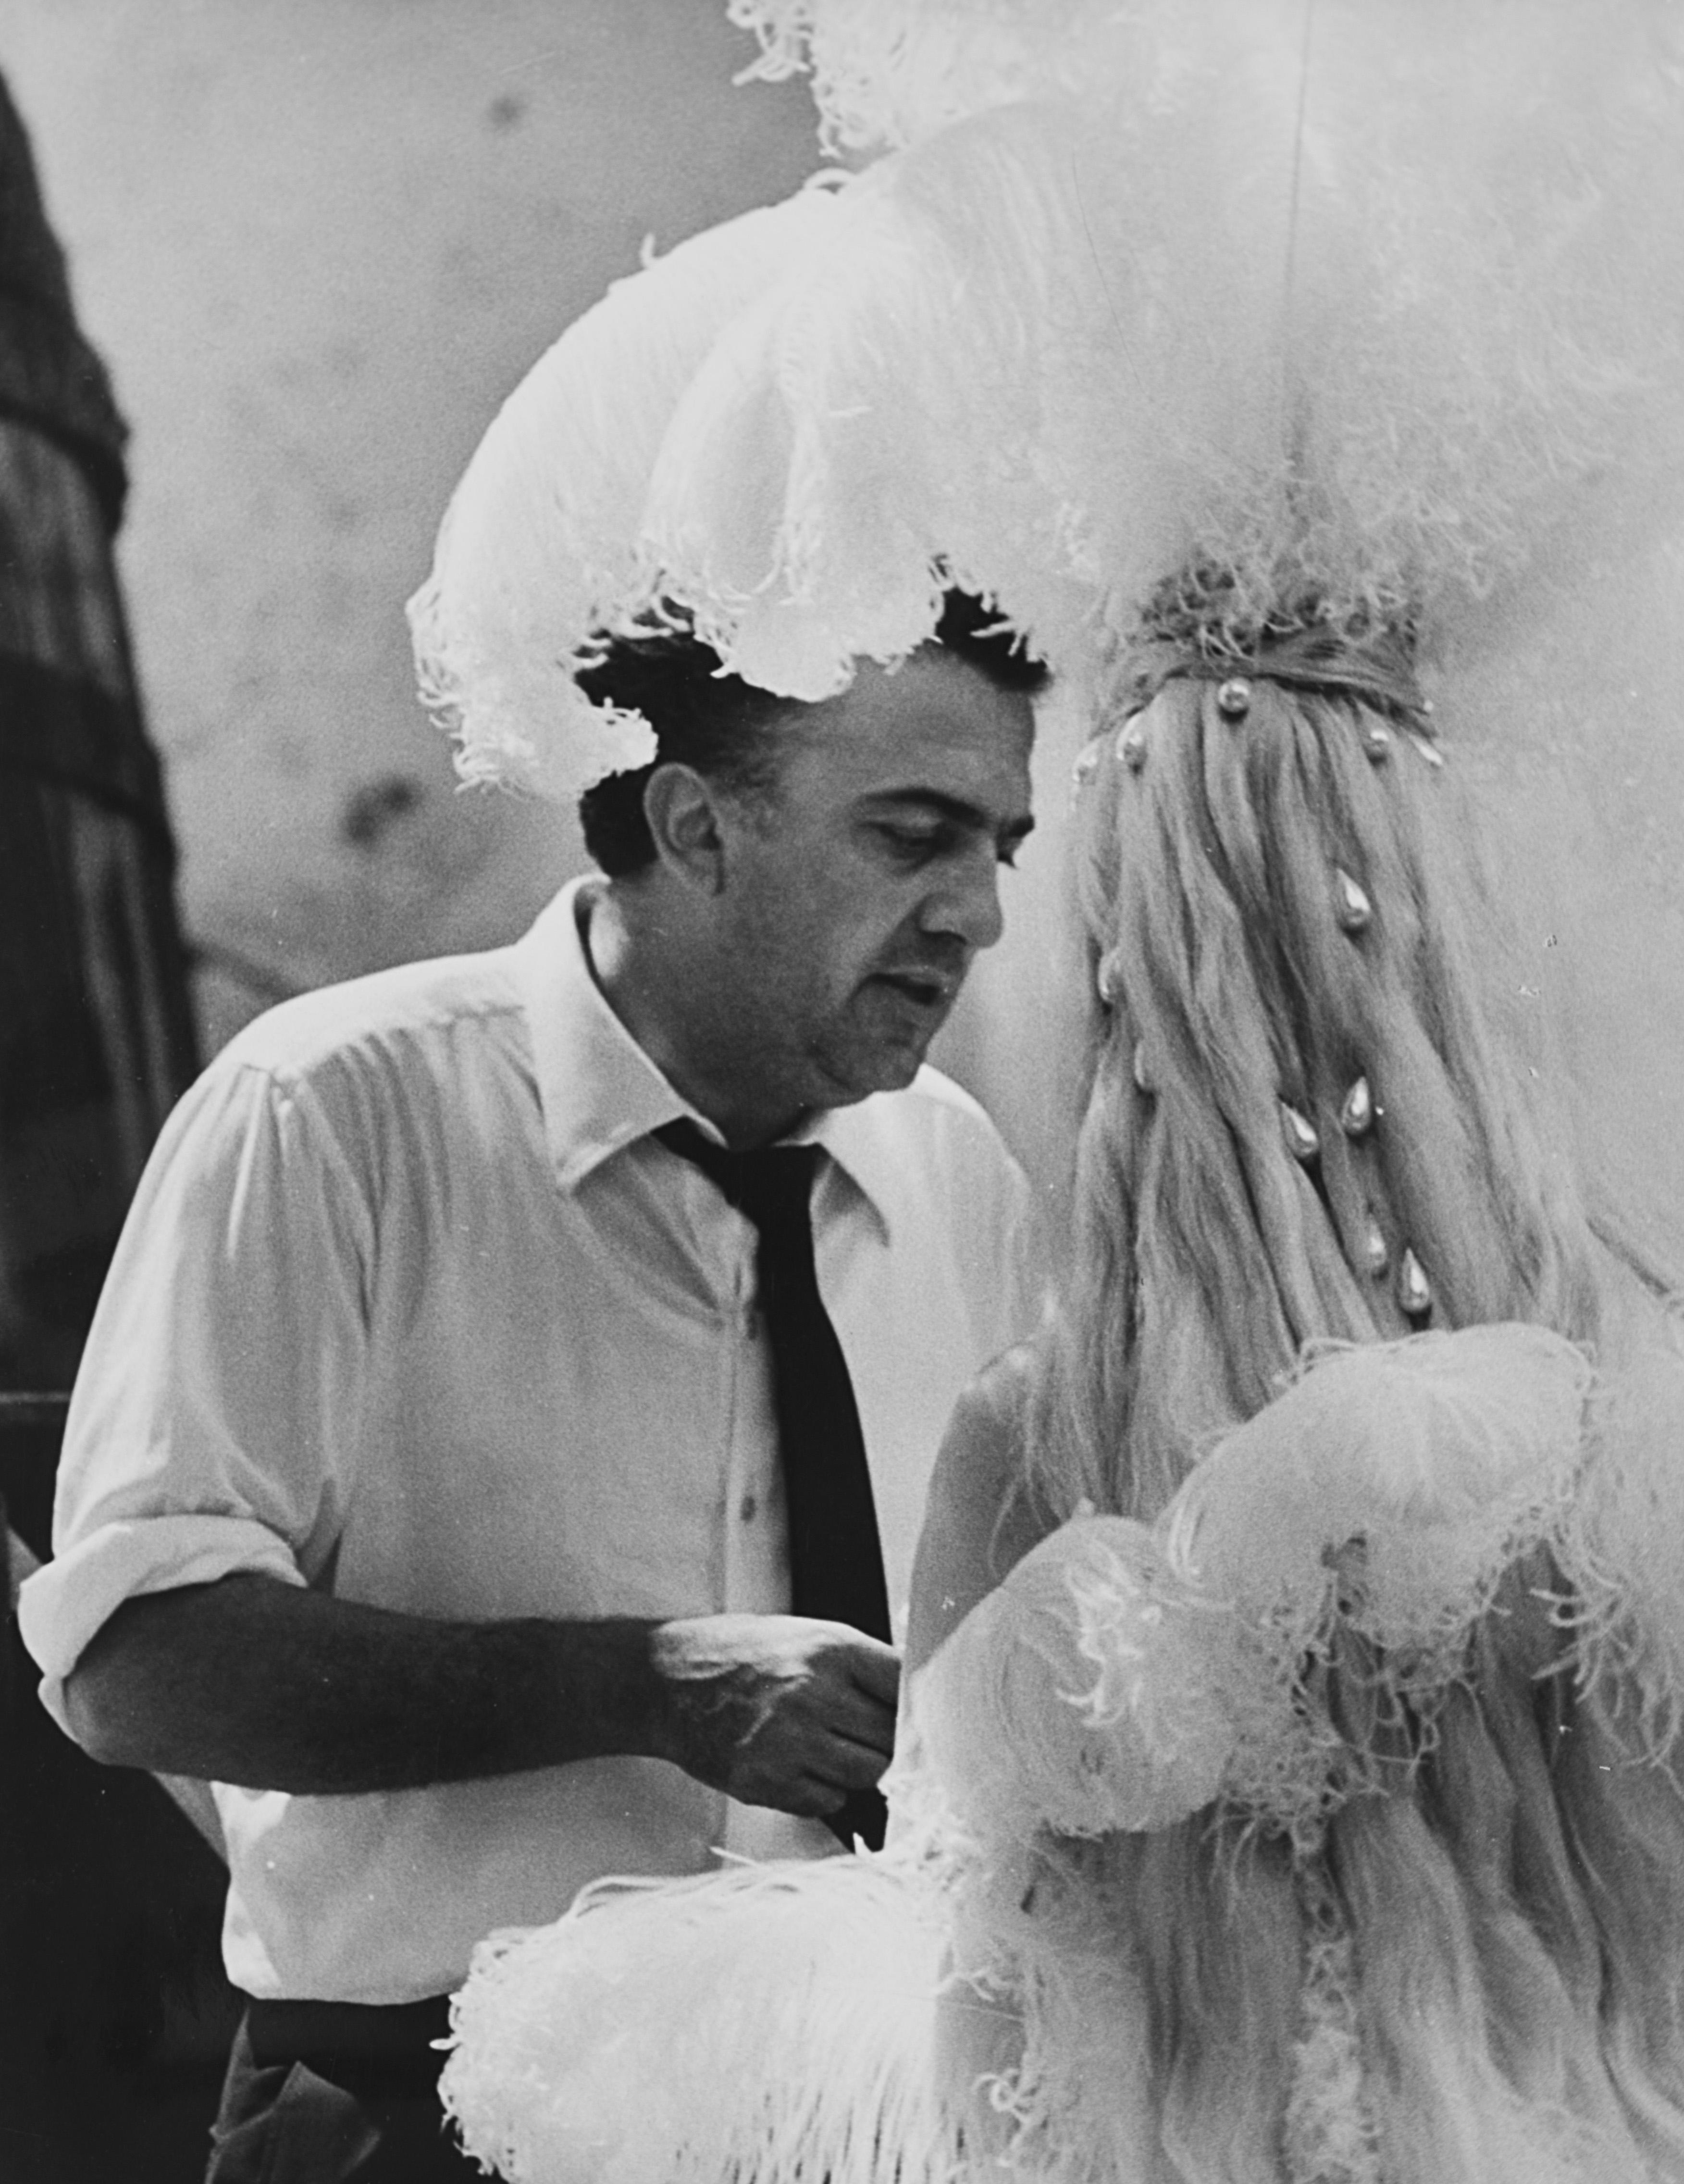 1960. Федерико Феллини на съемках фильма «Сладкая жизнь»